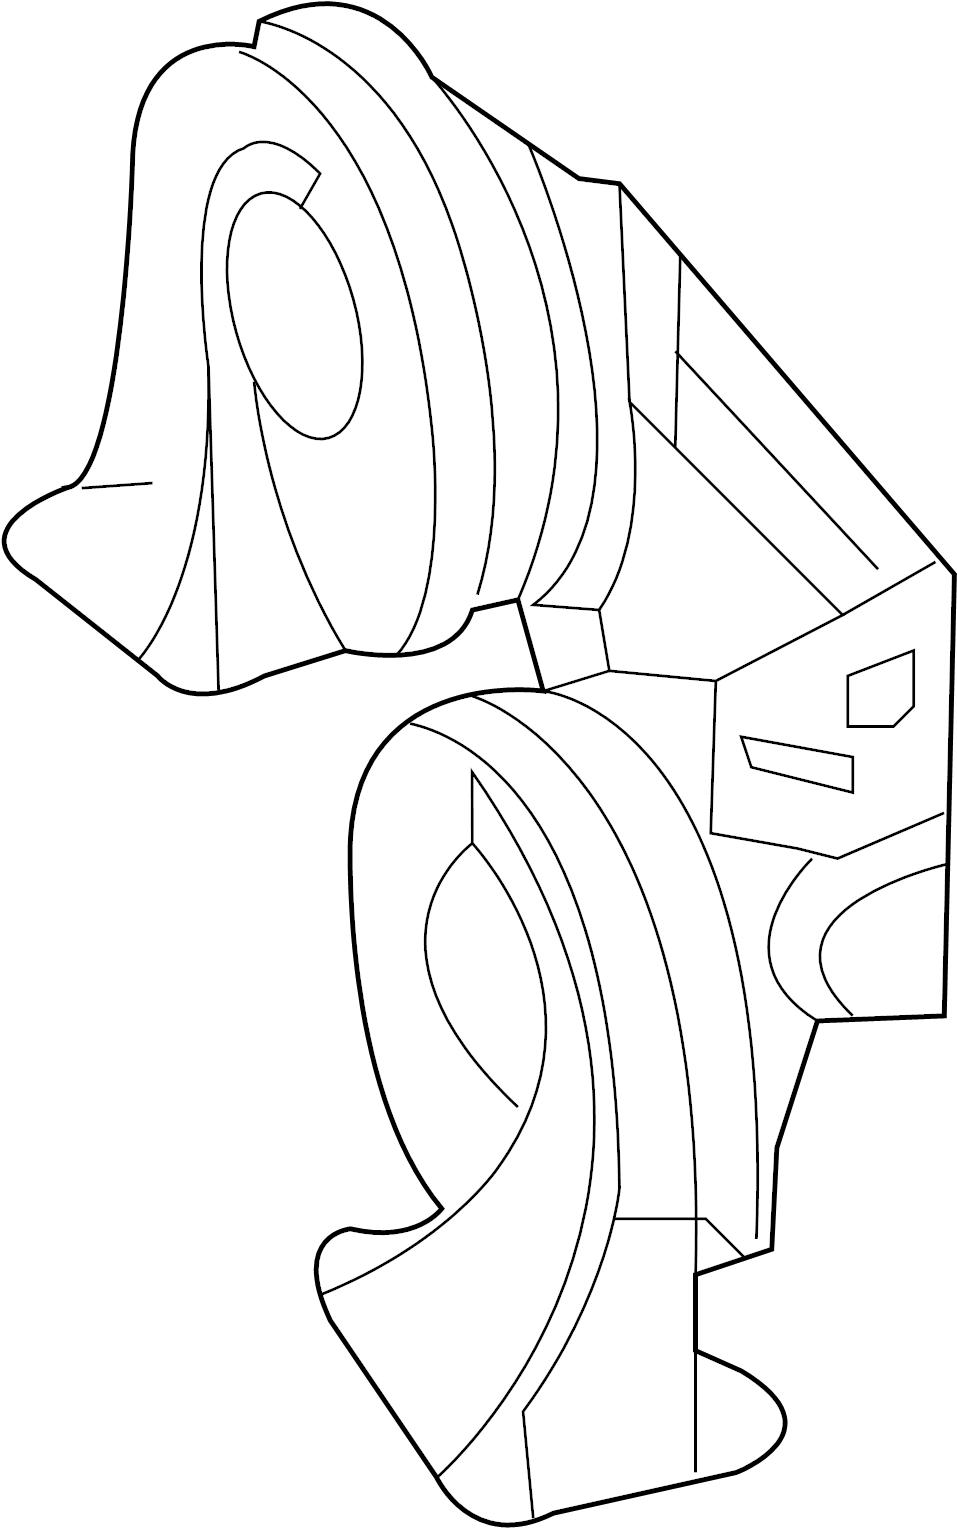 2007 Chevrolet Horn kit, generic (high note). Buick